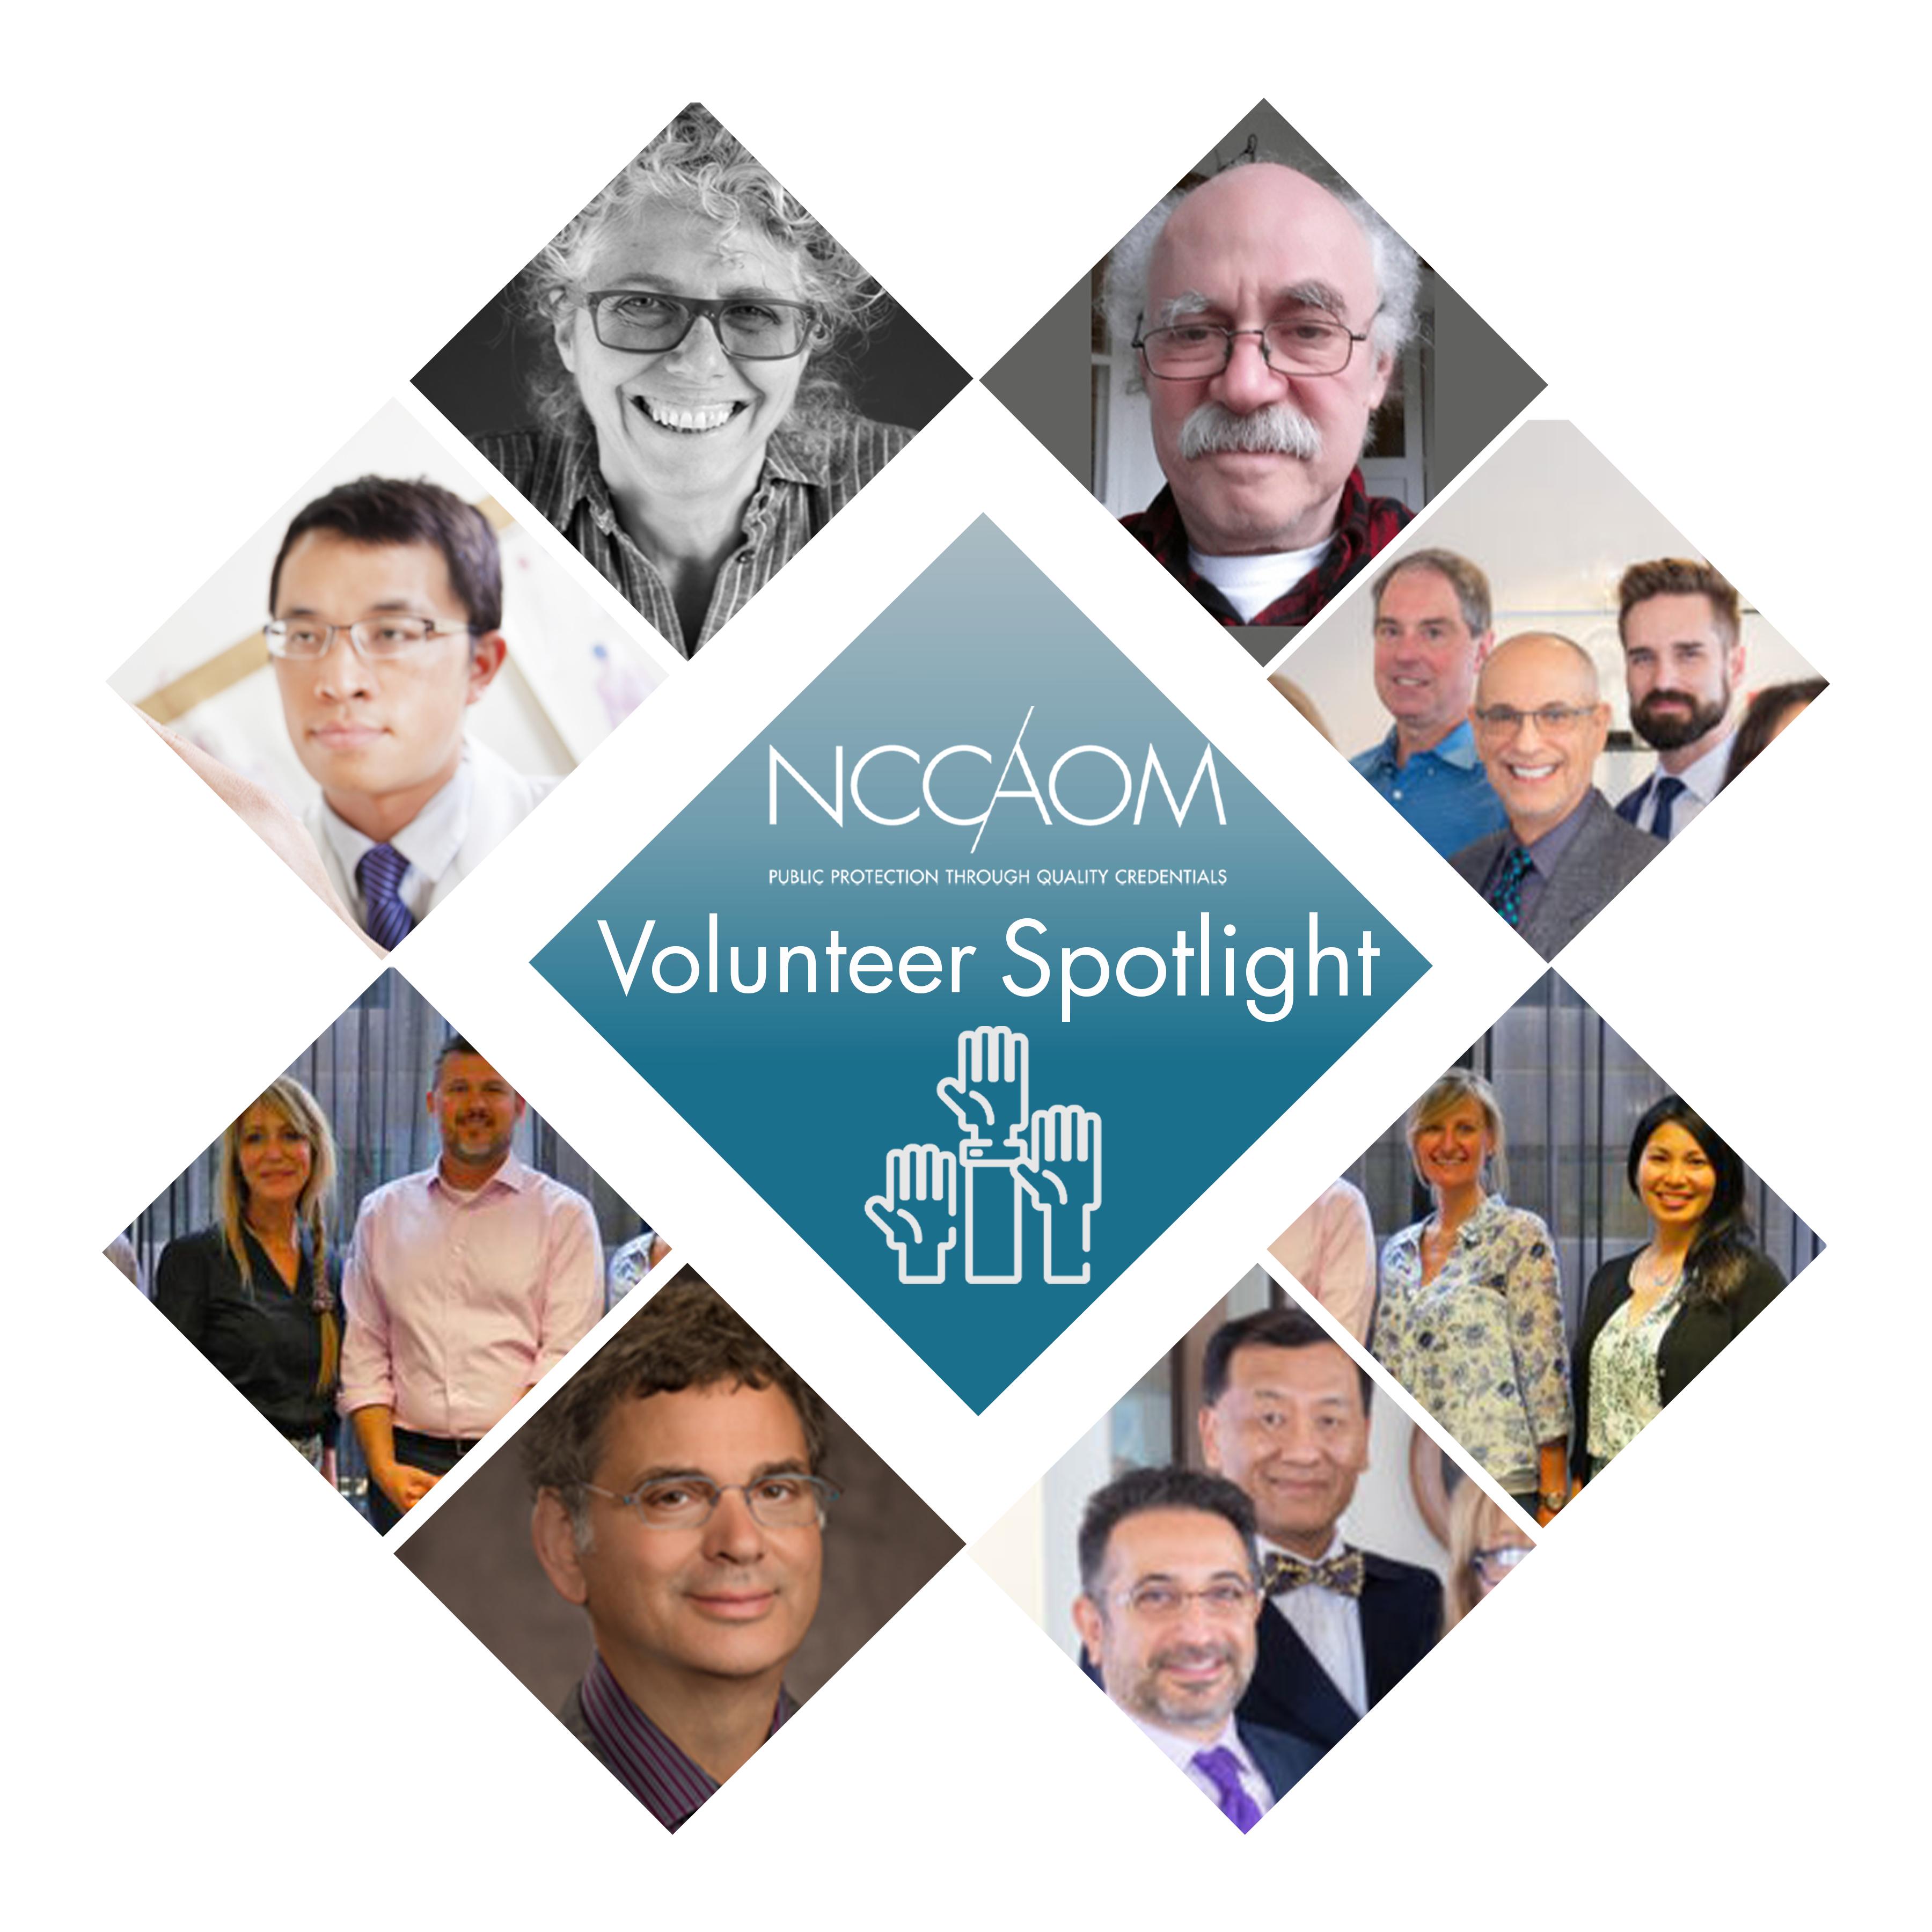 Volunteer Spotlight collage.